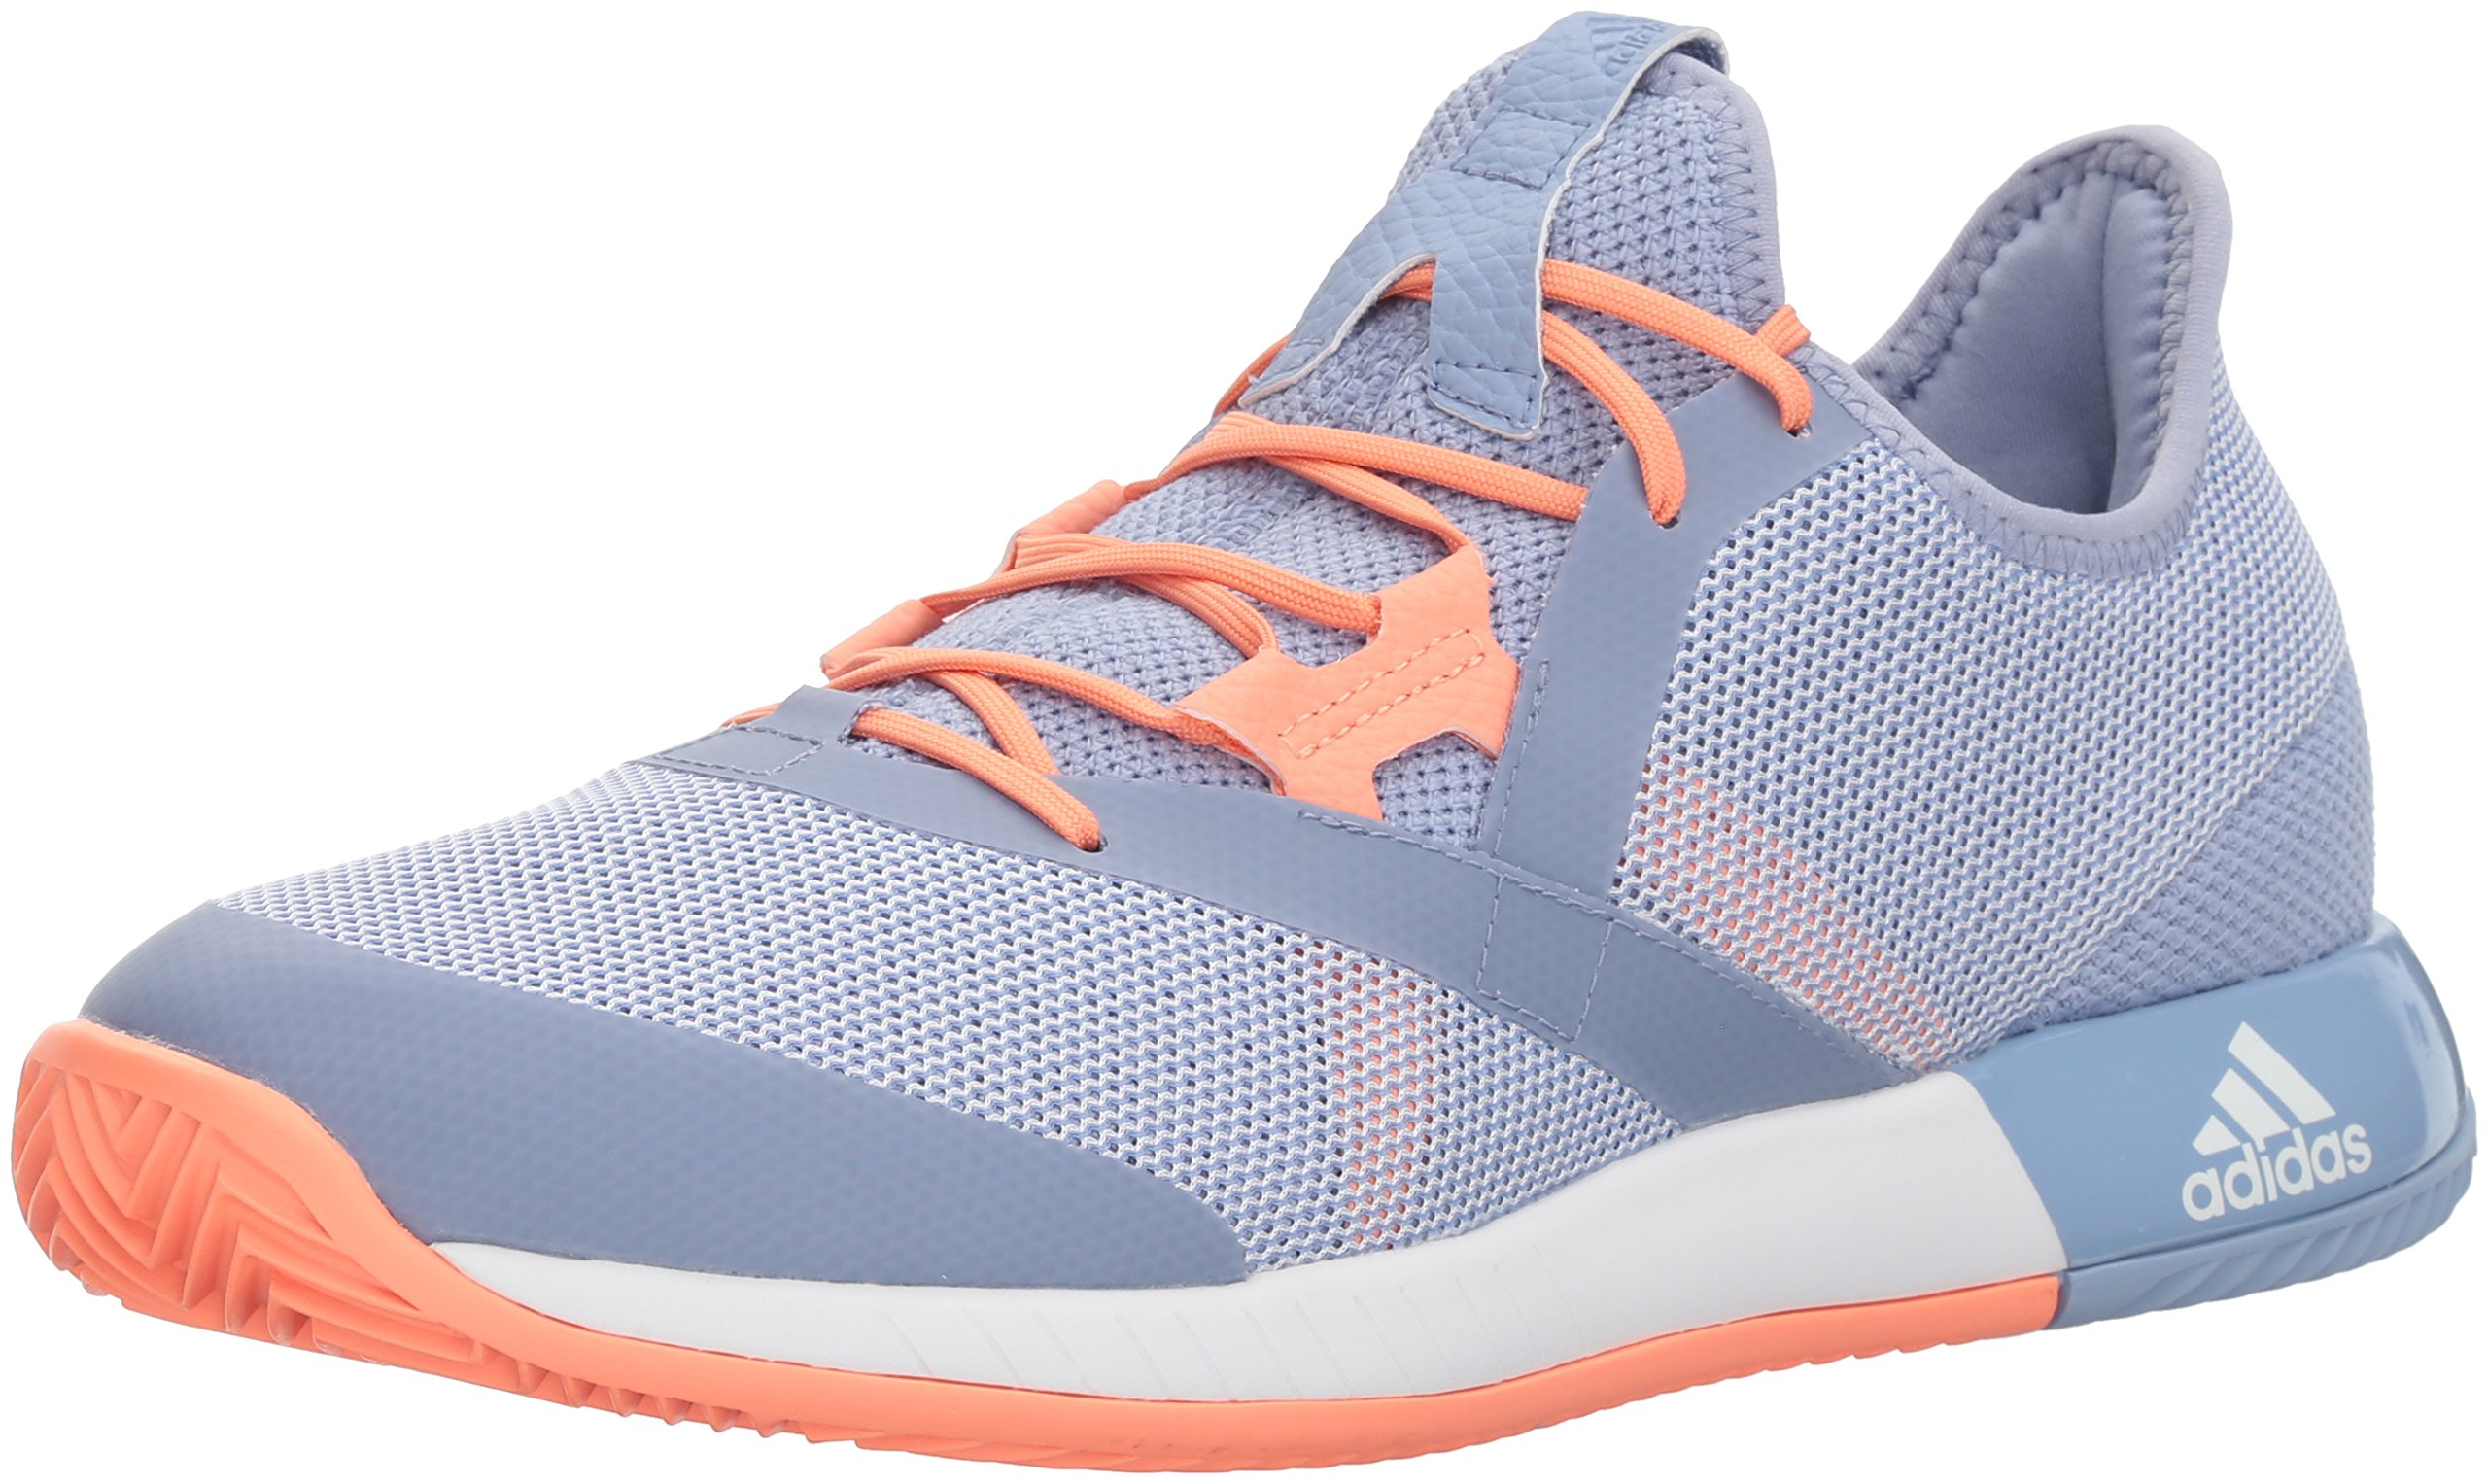 adidas Women's Adizero Defiant Bounce w Tennis Shoe, Chalk Blue/White/Chalk Coral, 11 M US